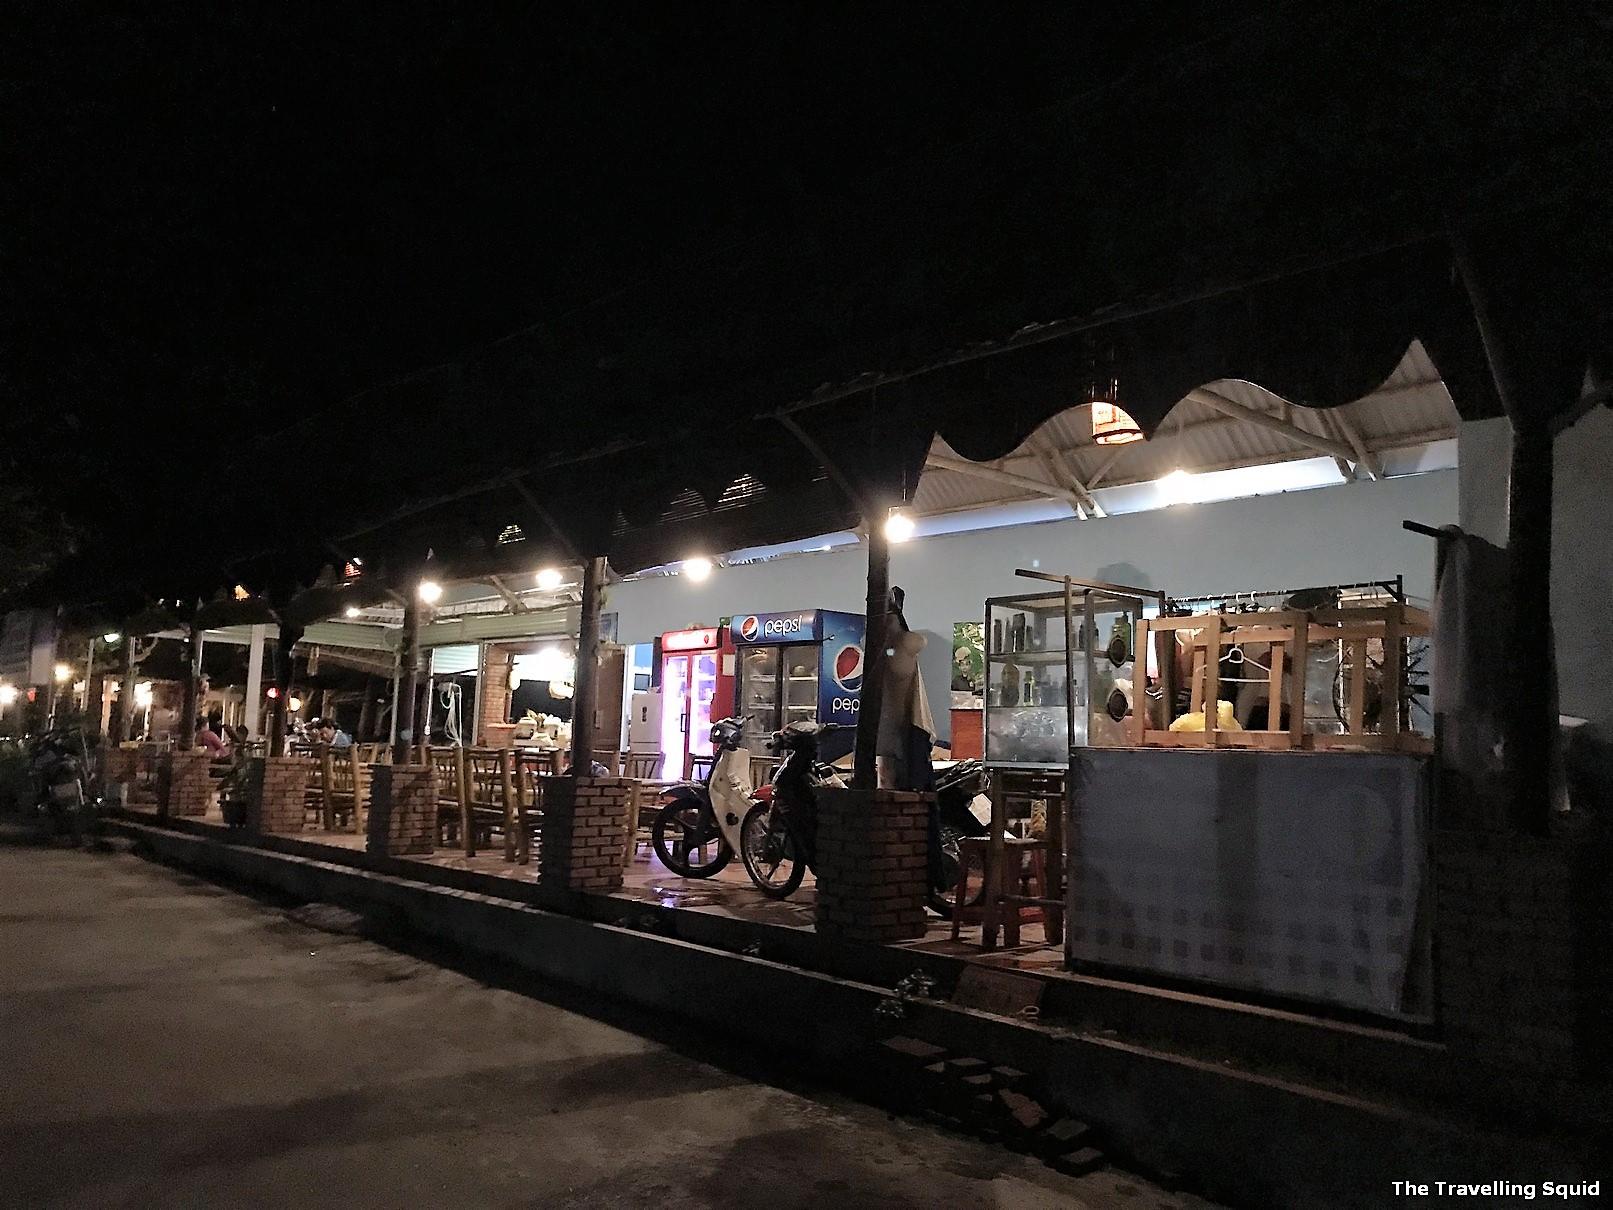 Soul Kitchen Beach Bar and Restaurant in Hoi An